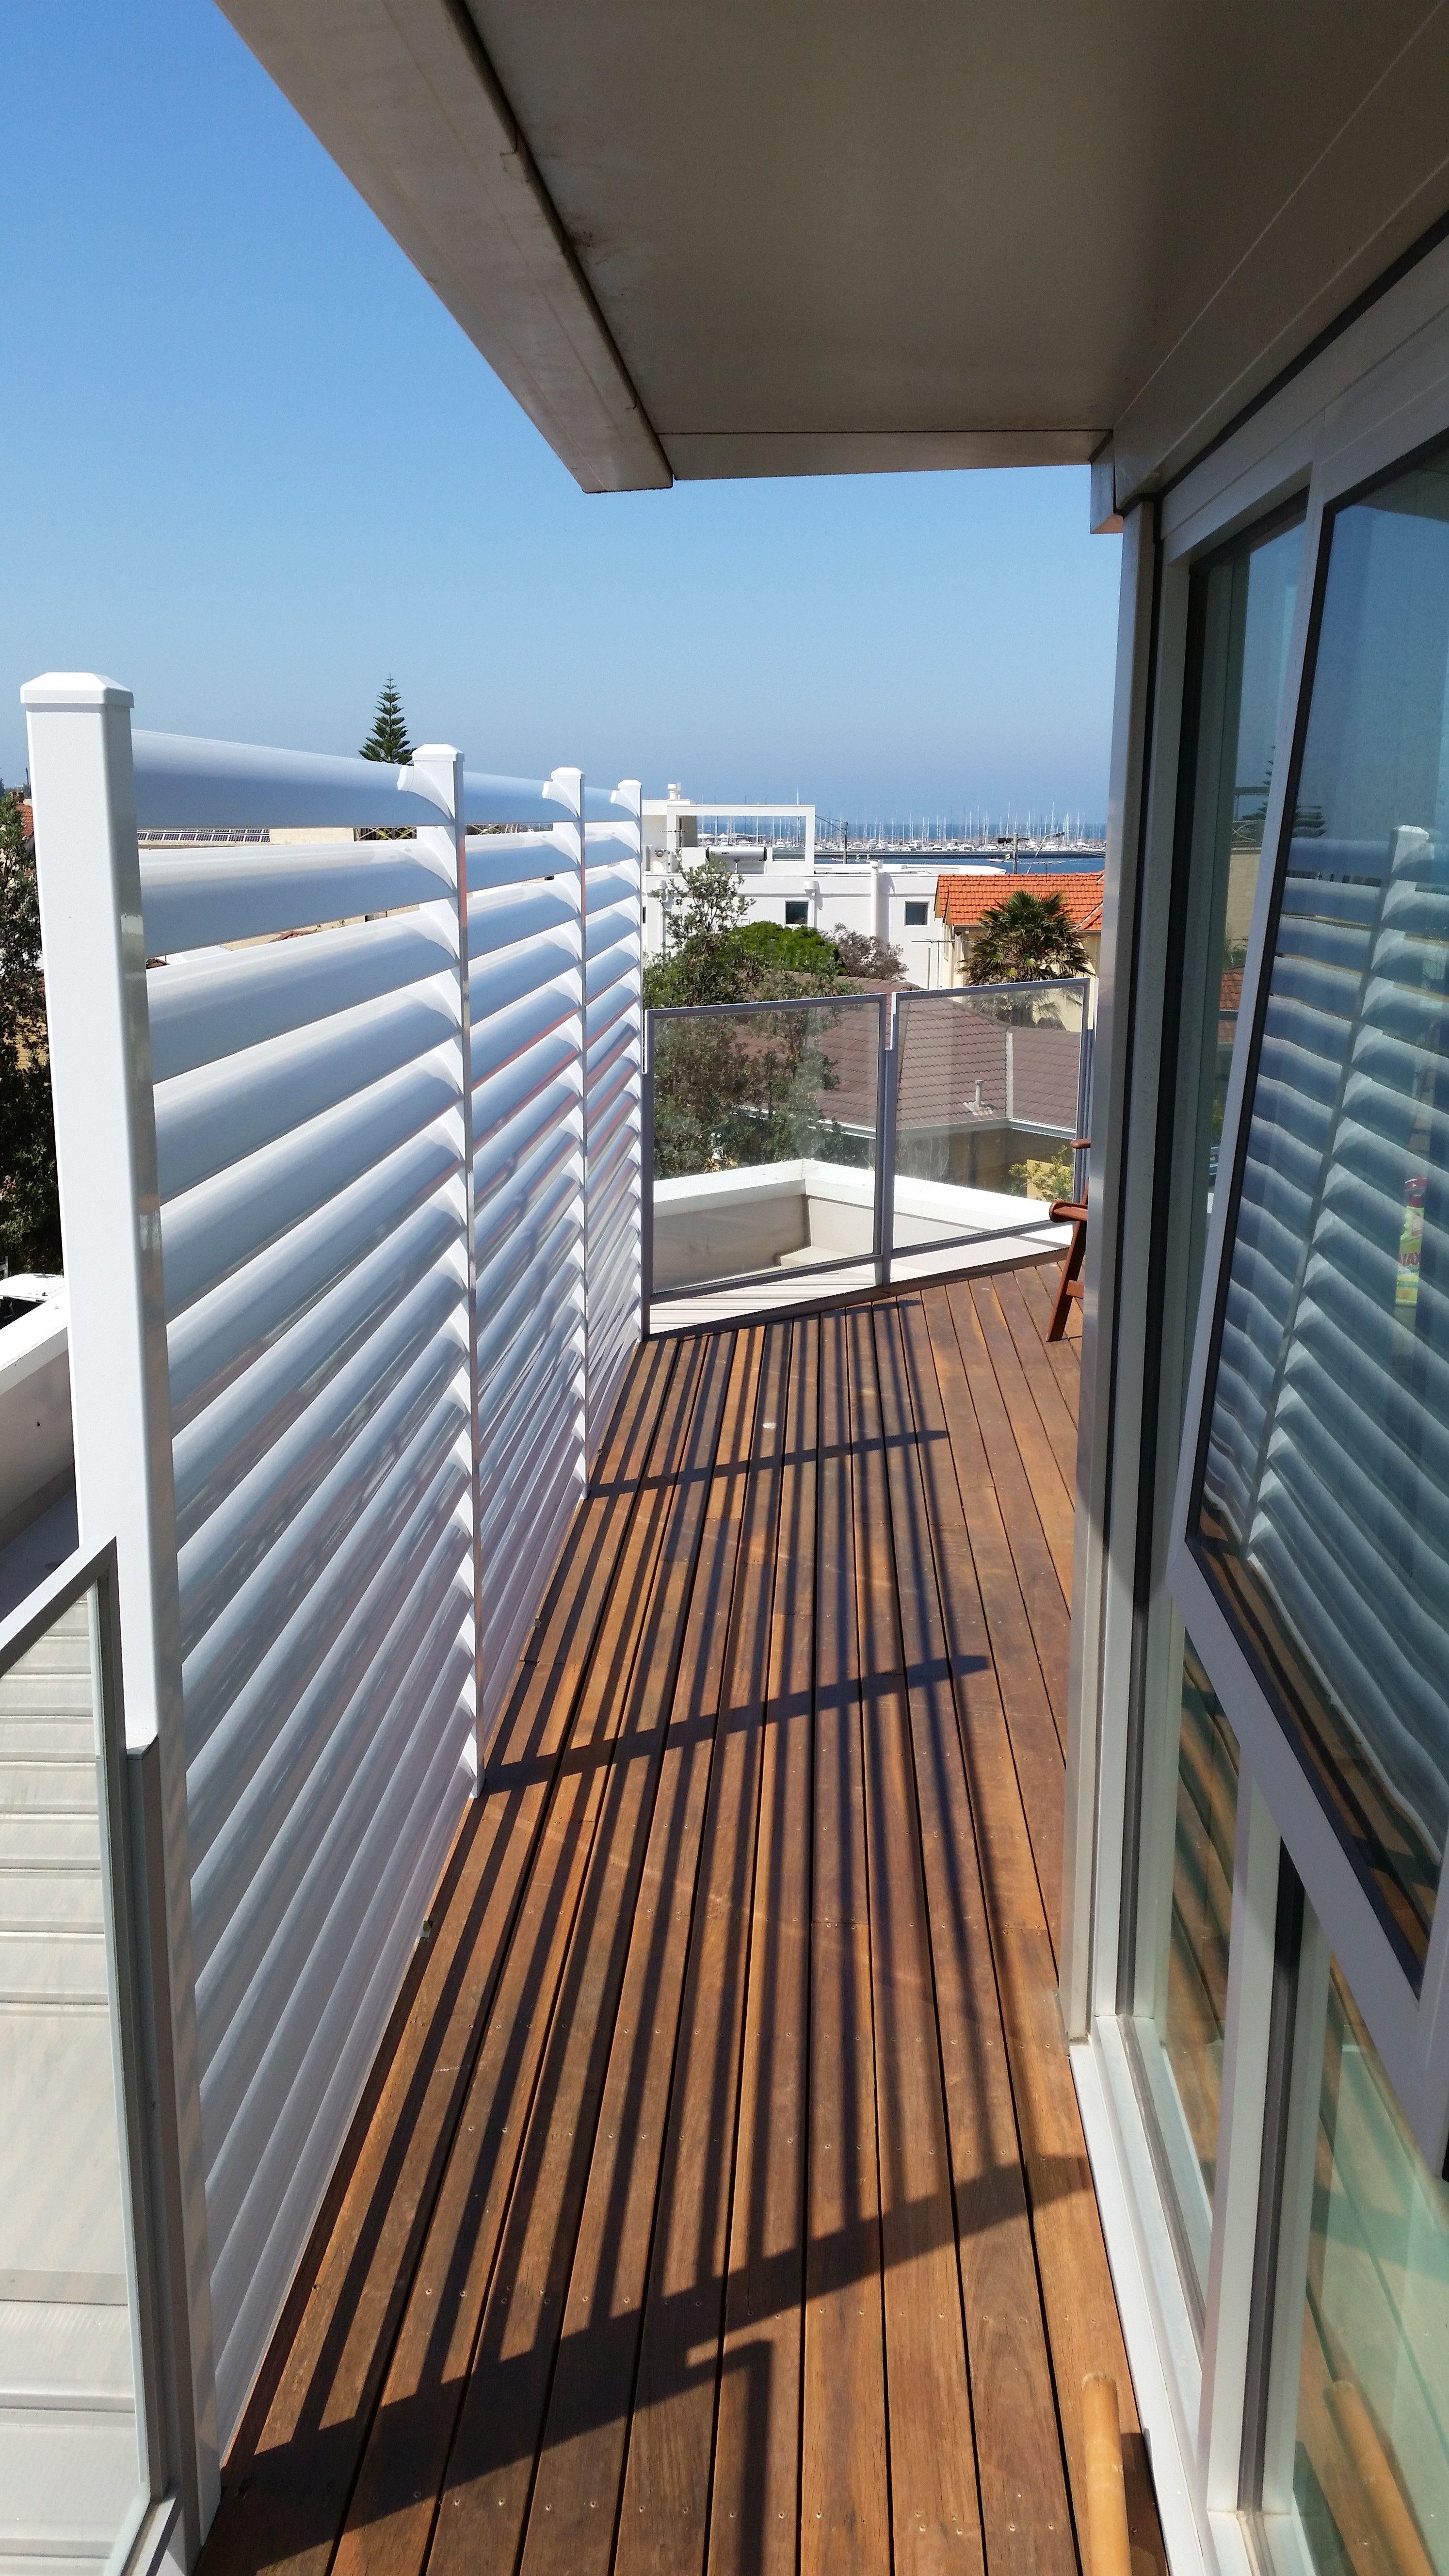 Fixed Louver Blade Balcony Privacy Screens Deck Carport